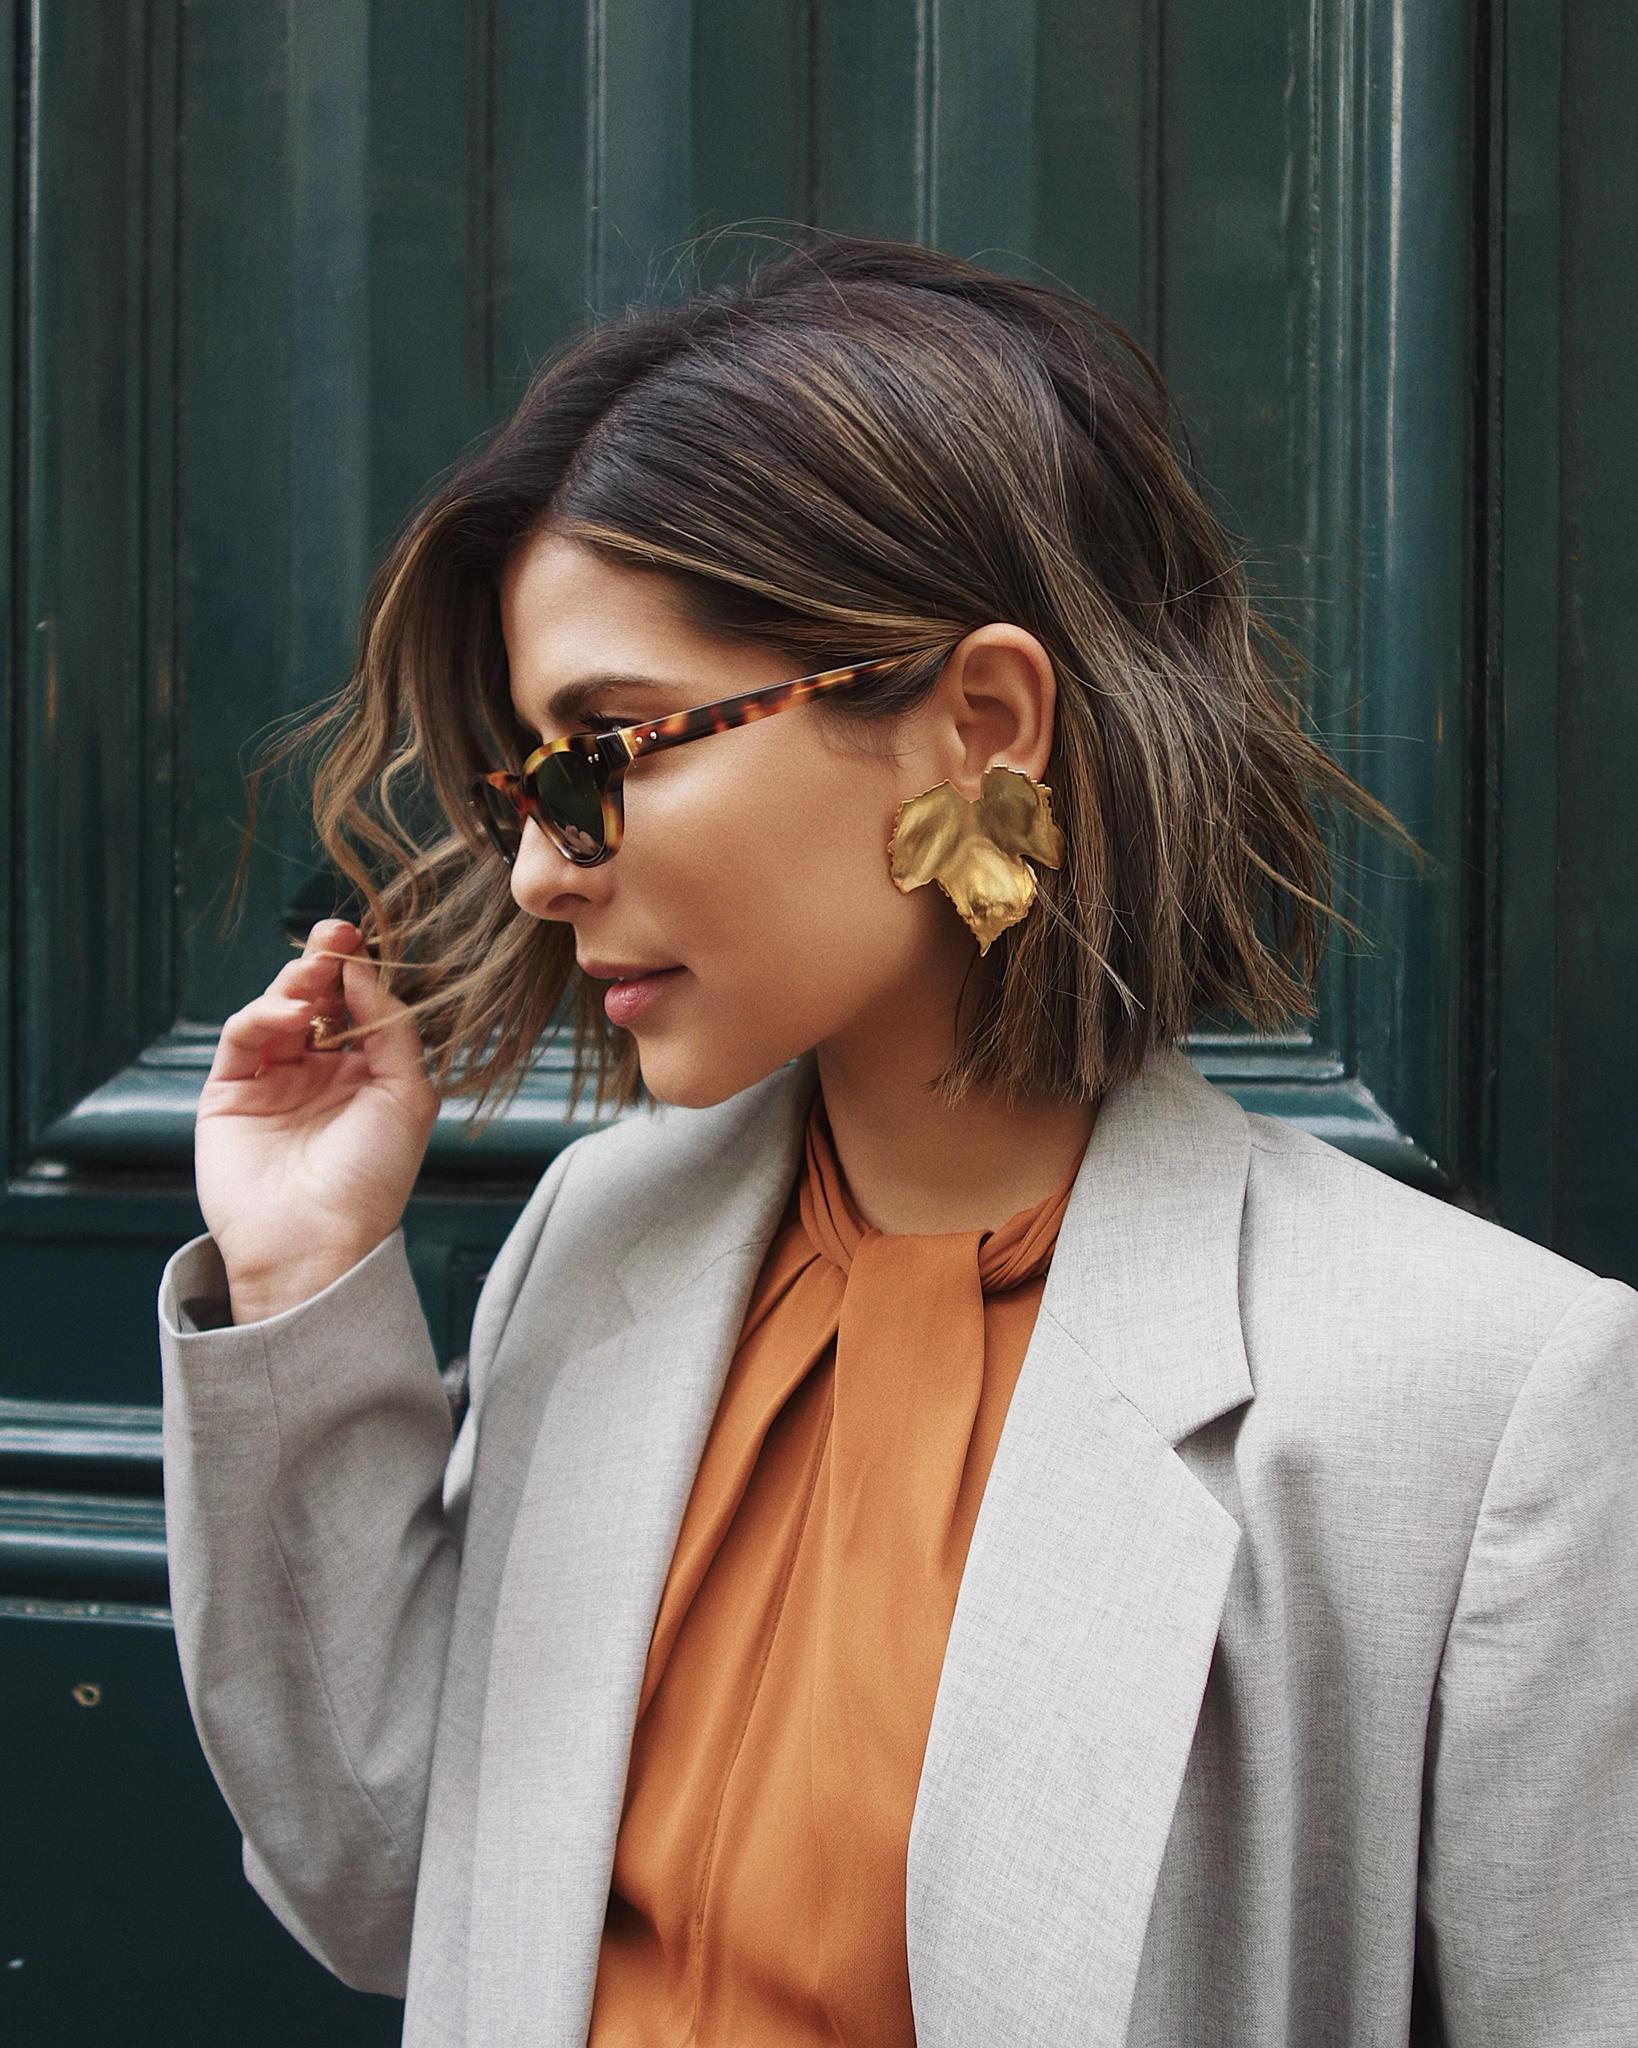 Paris Fashion Week FW19 Recap by Pam Hetlinger | TheGirlFromPanama.com | paris fashion week street style, fashion week spring 2019 street style, gold statement earrings, wavy lob hairstyle